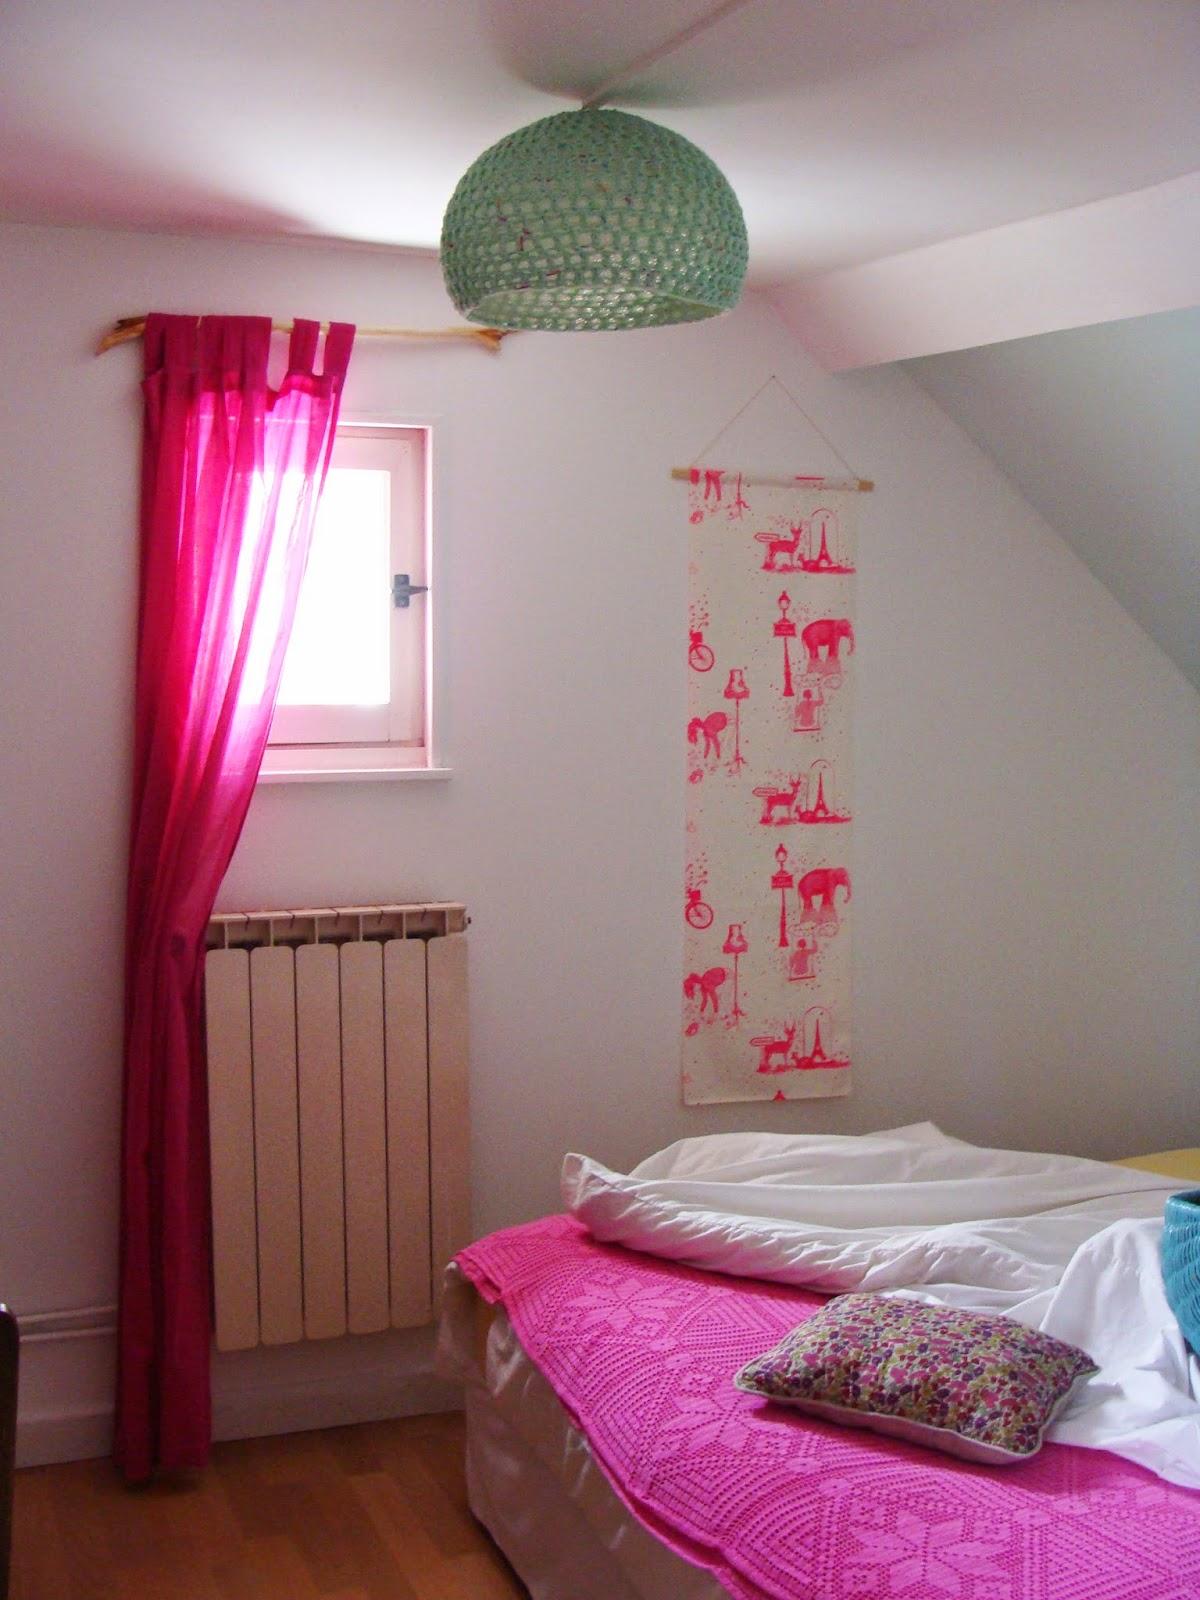 #B71441 Orphyse 1171 avis ma petite chambre 1200x1600 px @ aertt.com